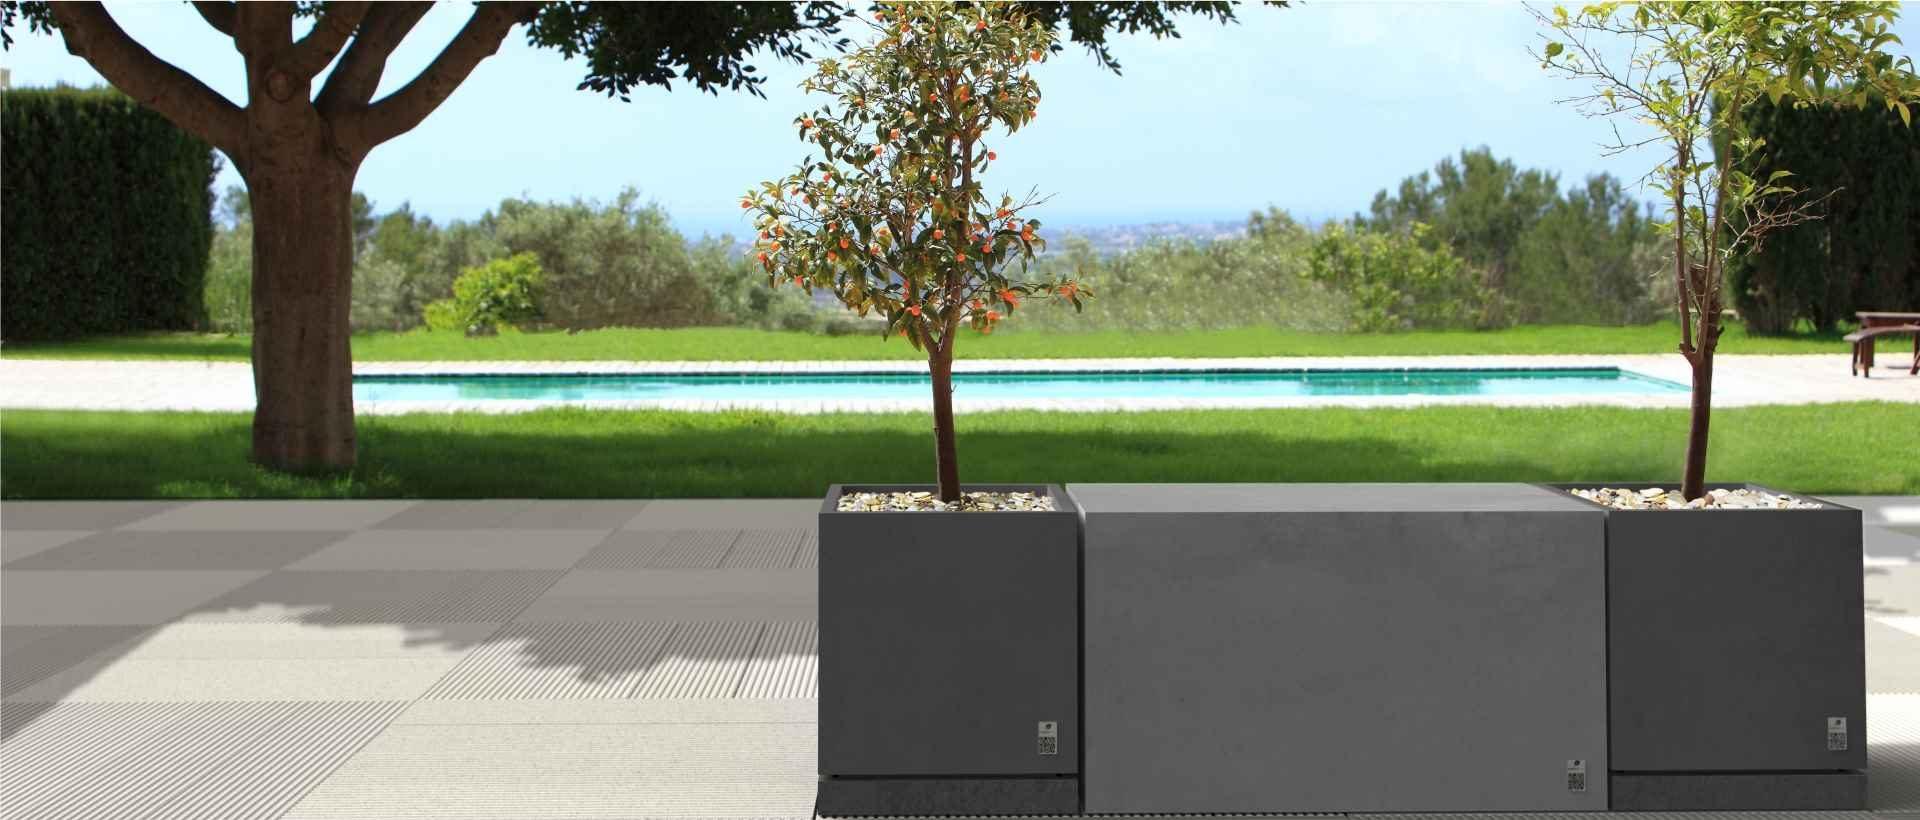 Style slabs, Regular Box and Regular planter, Modern Line